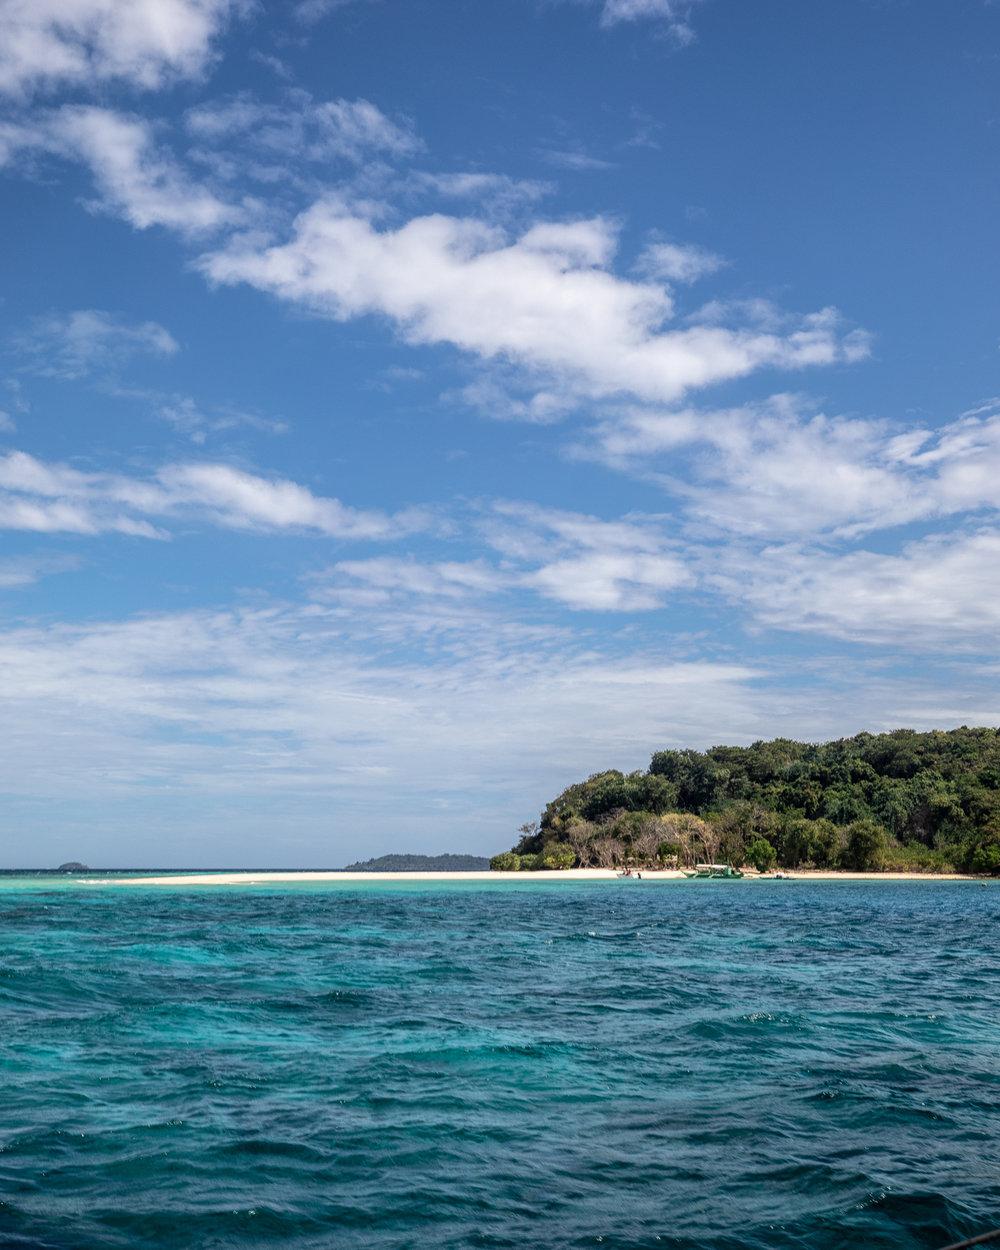 The views of Ditatayan Island from the boat, Coron Palawan